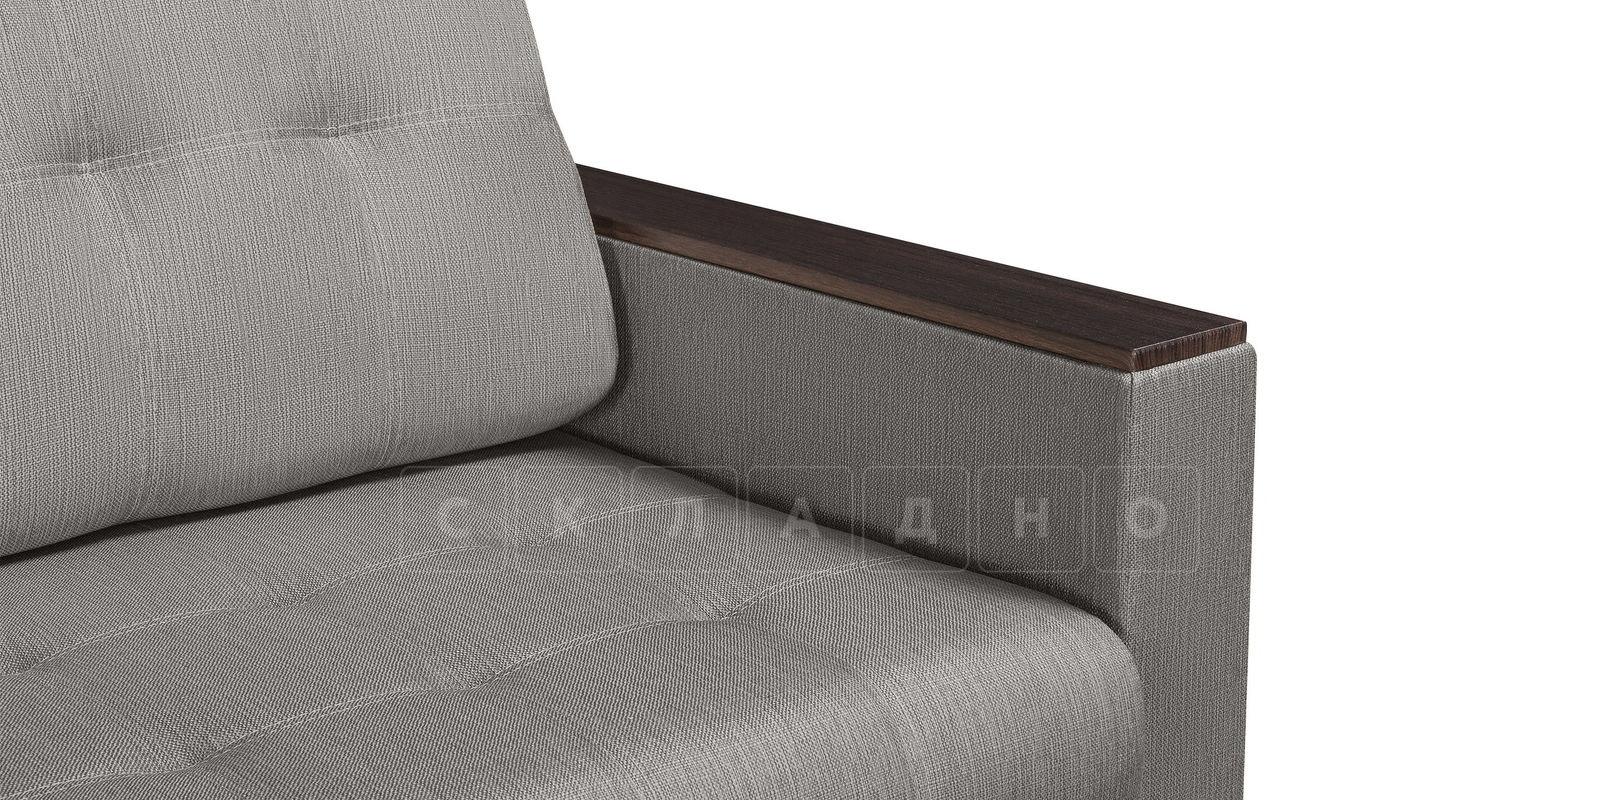 Диван Атланта рогожка серого цвета фото 4 | интернет-магазин Складно